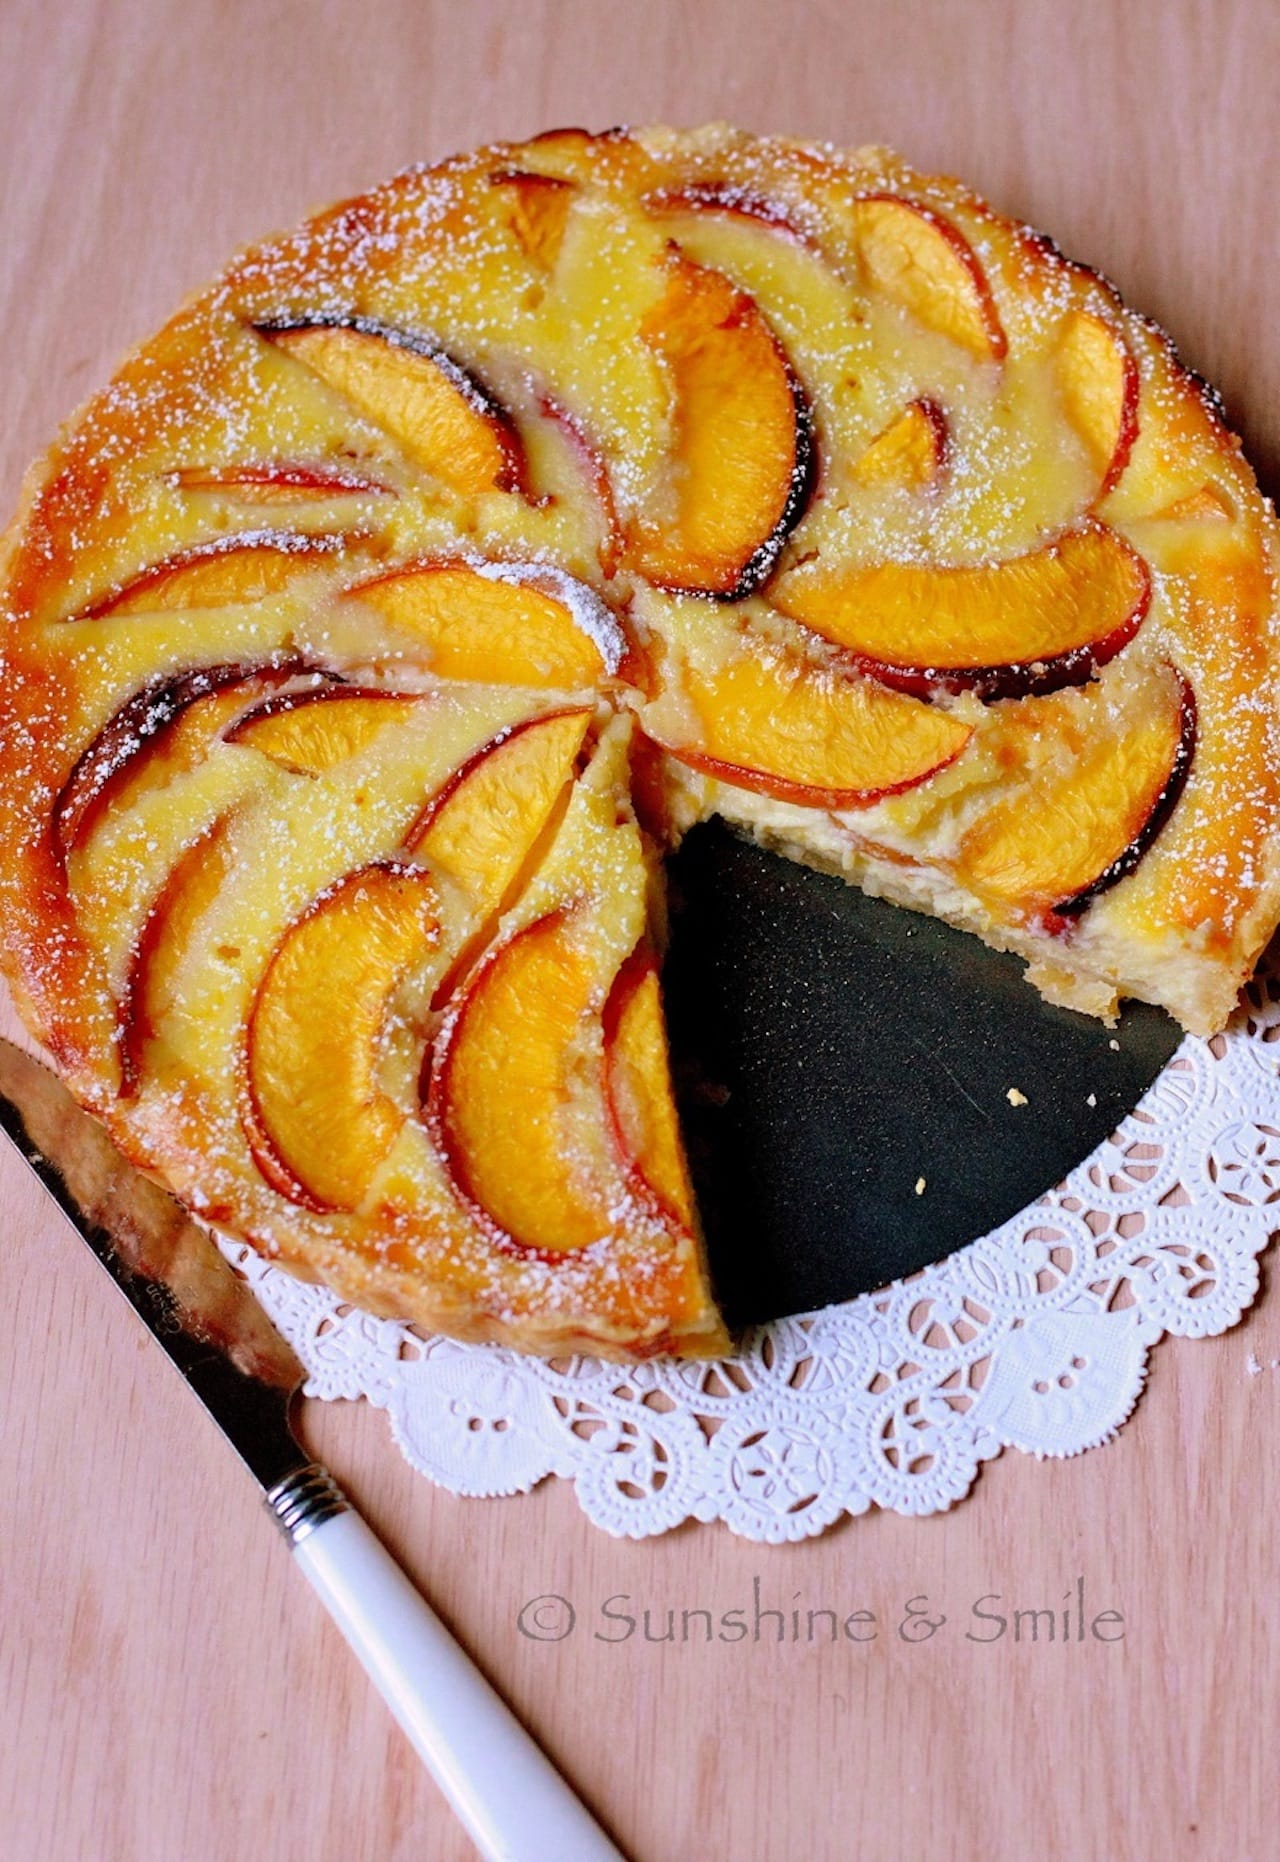 Flaky Tart with Peach and Ricotta 1